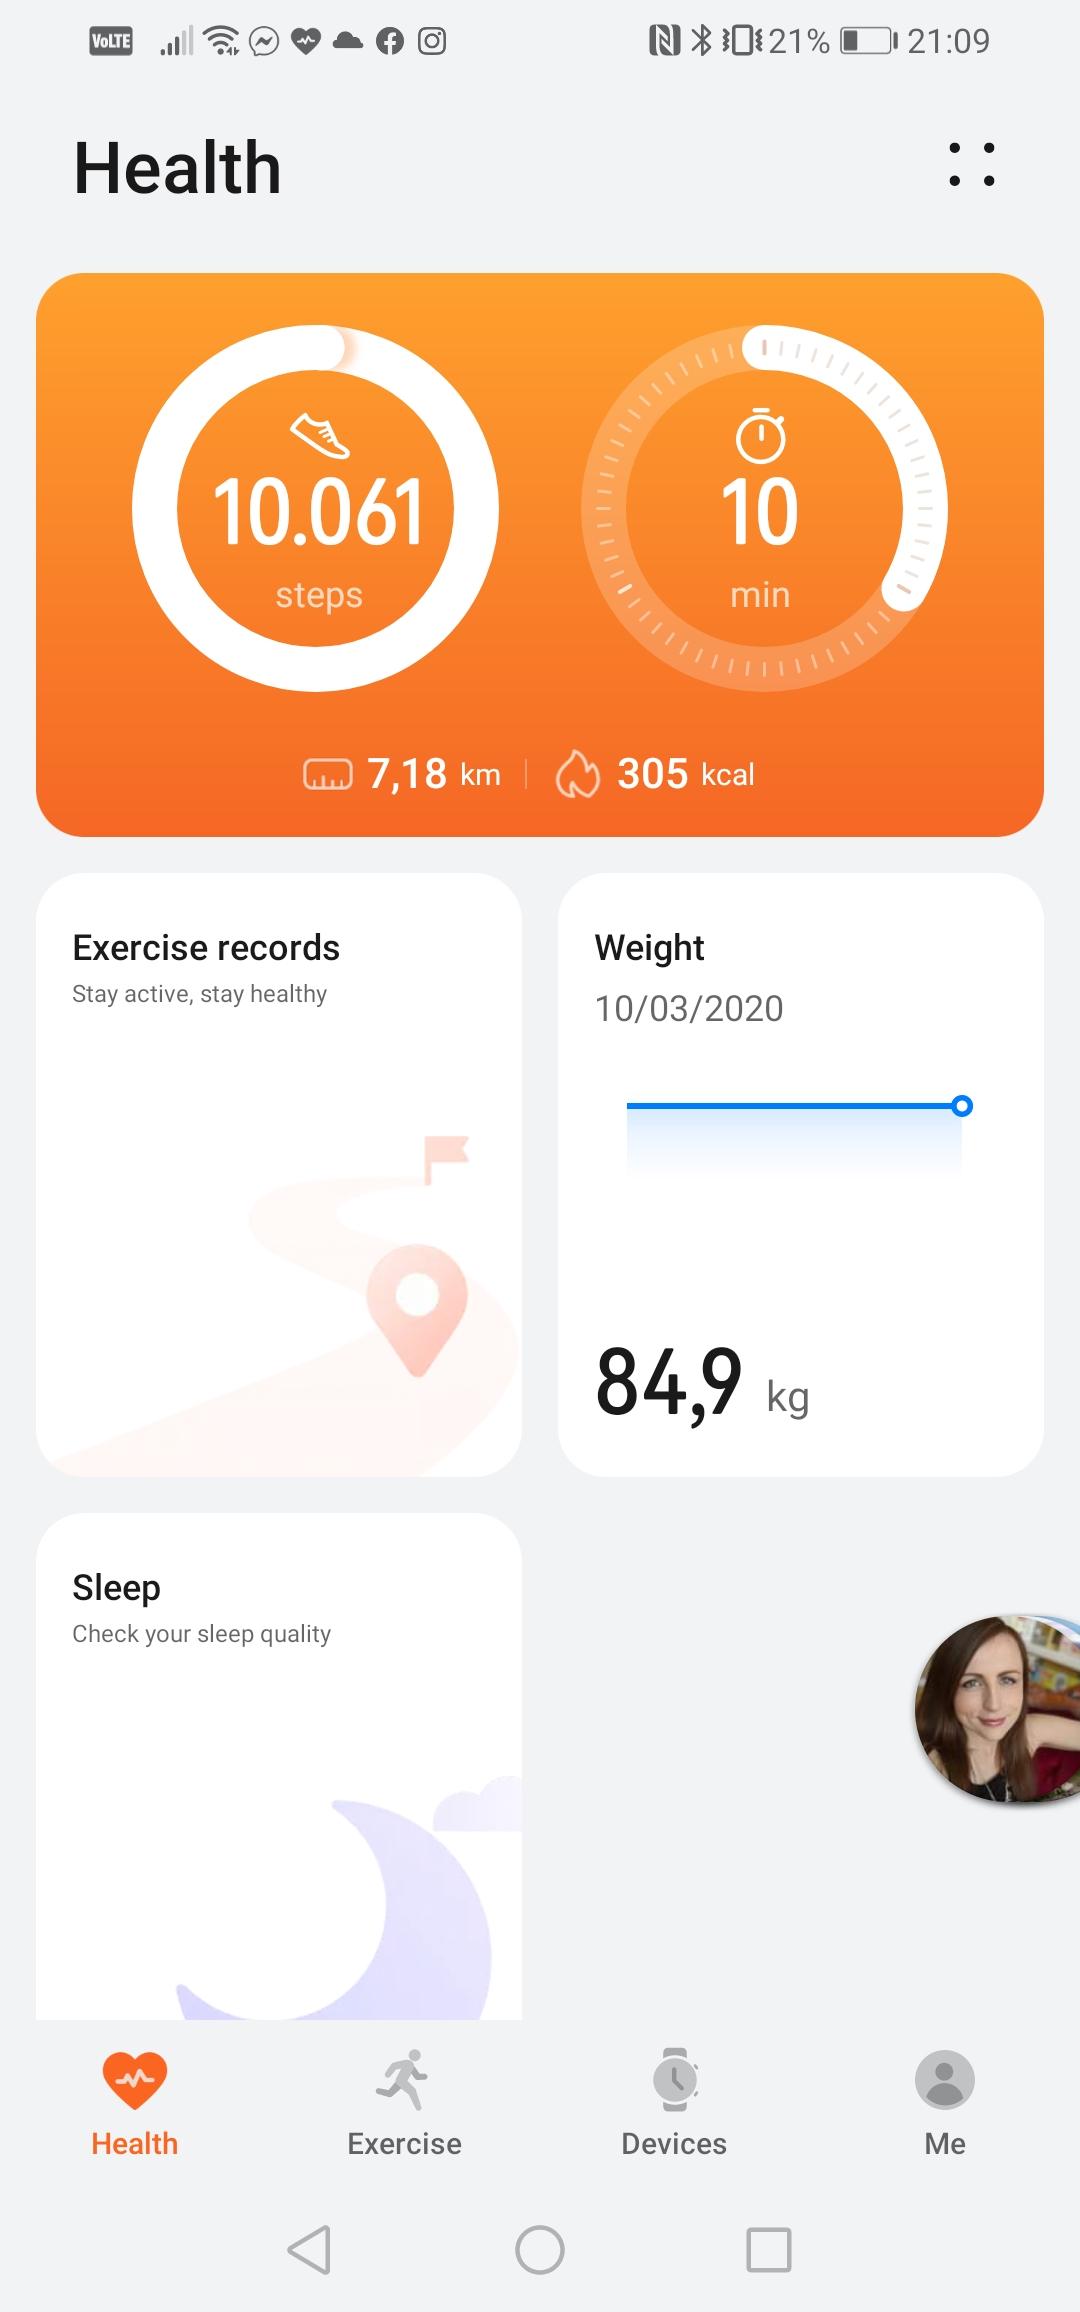 screenshot_20210423_210918_com-huawei-health